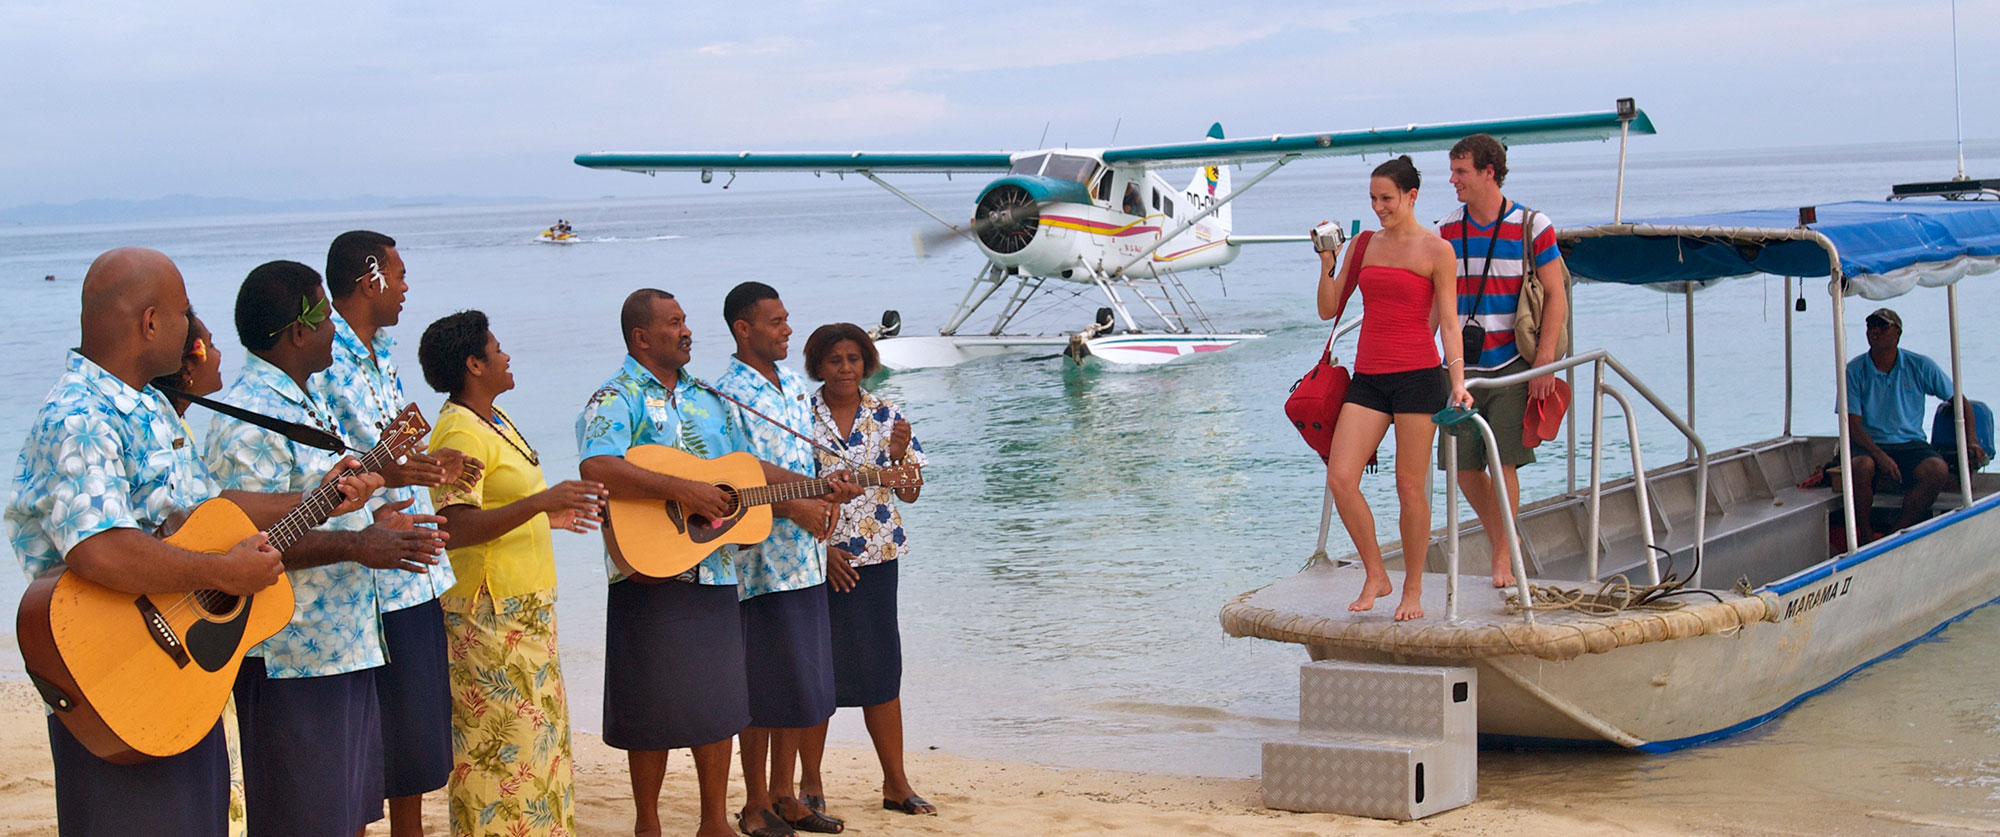 New Zealand Fiji Package Culture - Castaway Island Fiji